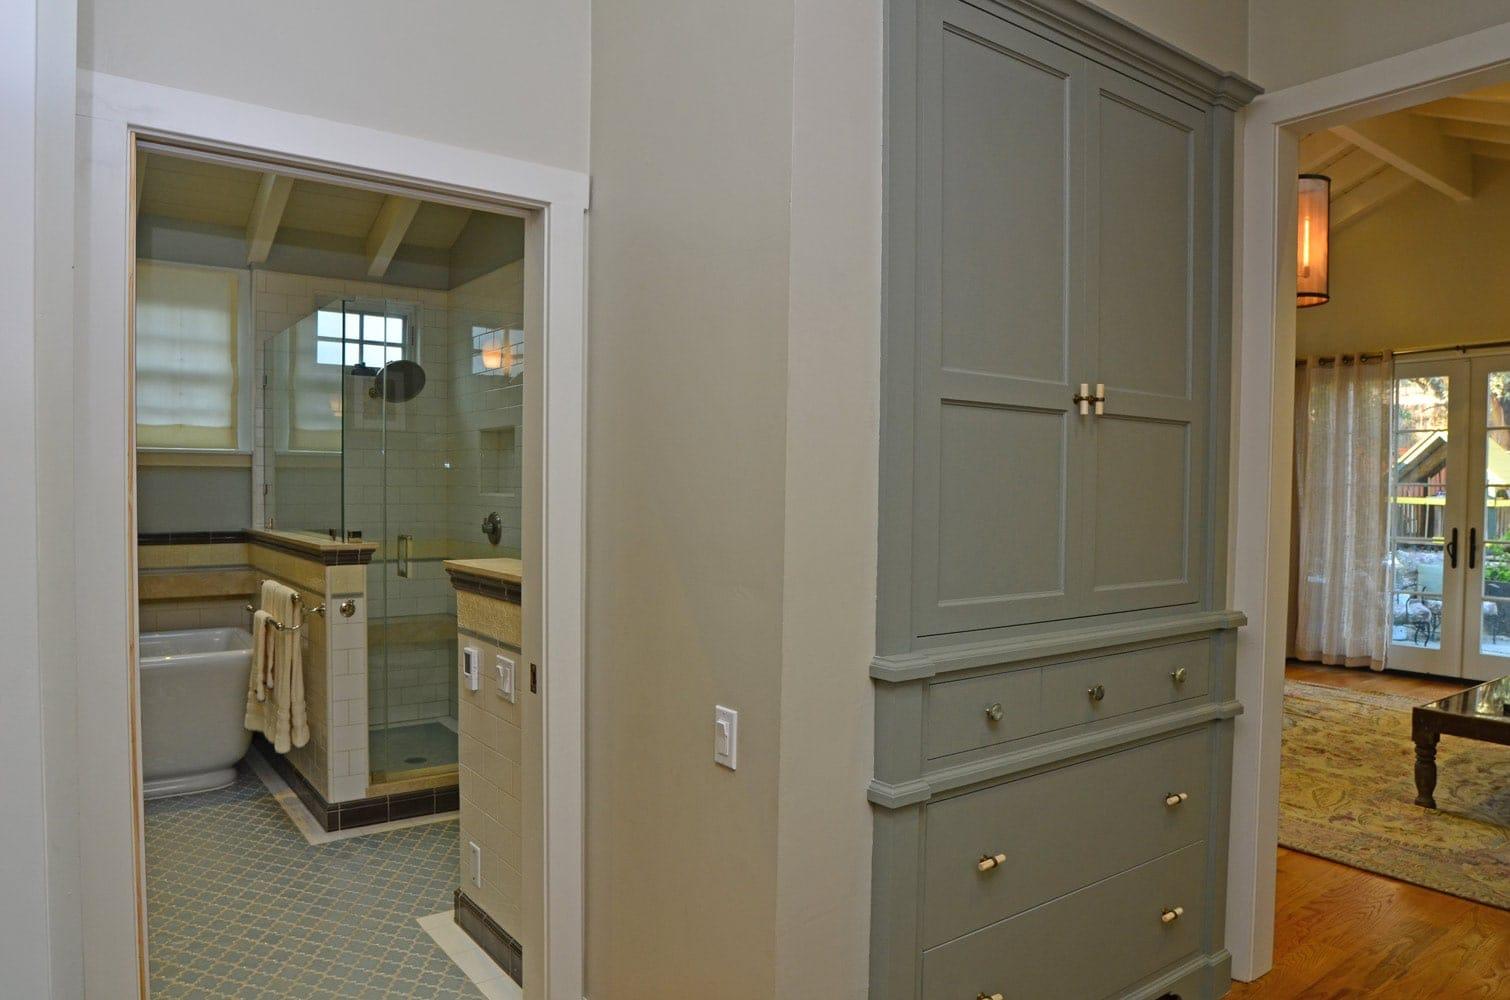 Hallway interior design in Verdugo Woodlands, CA